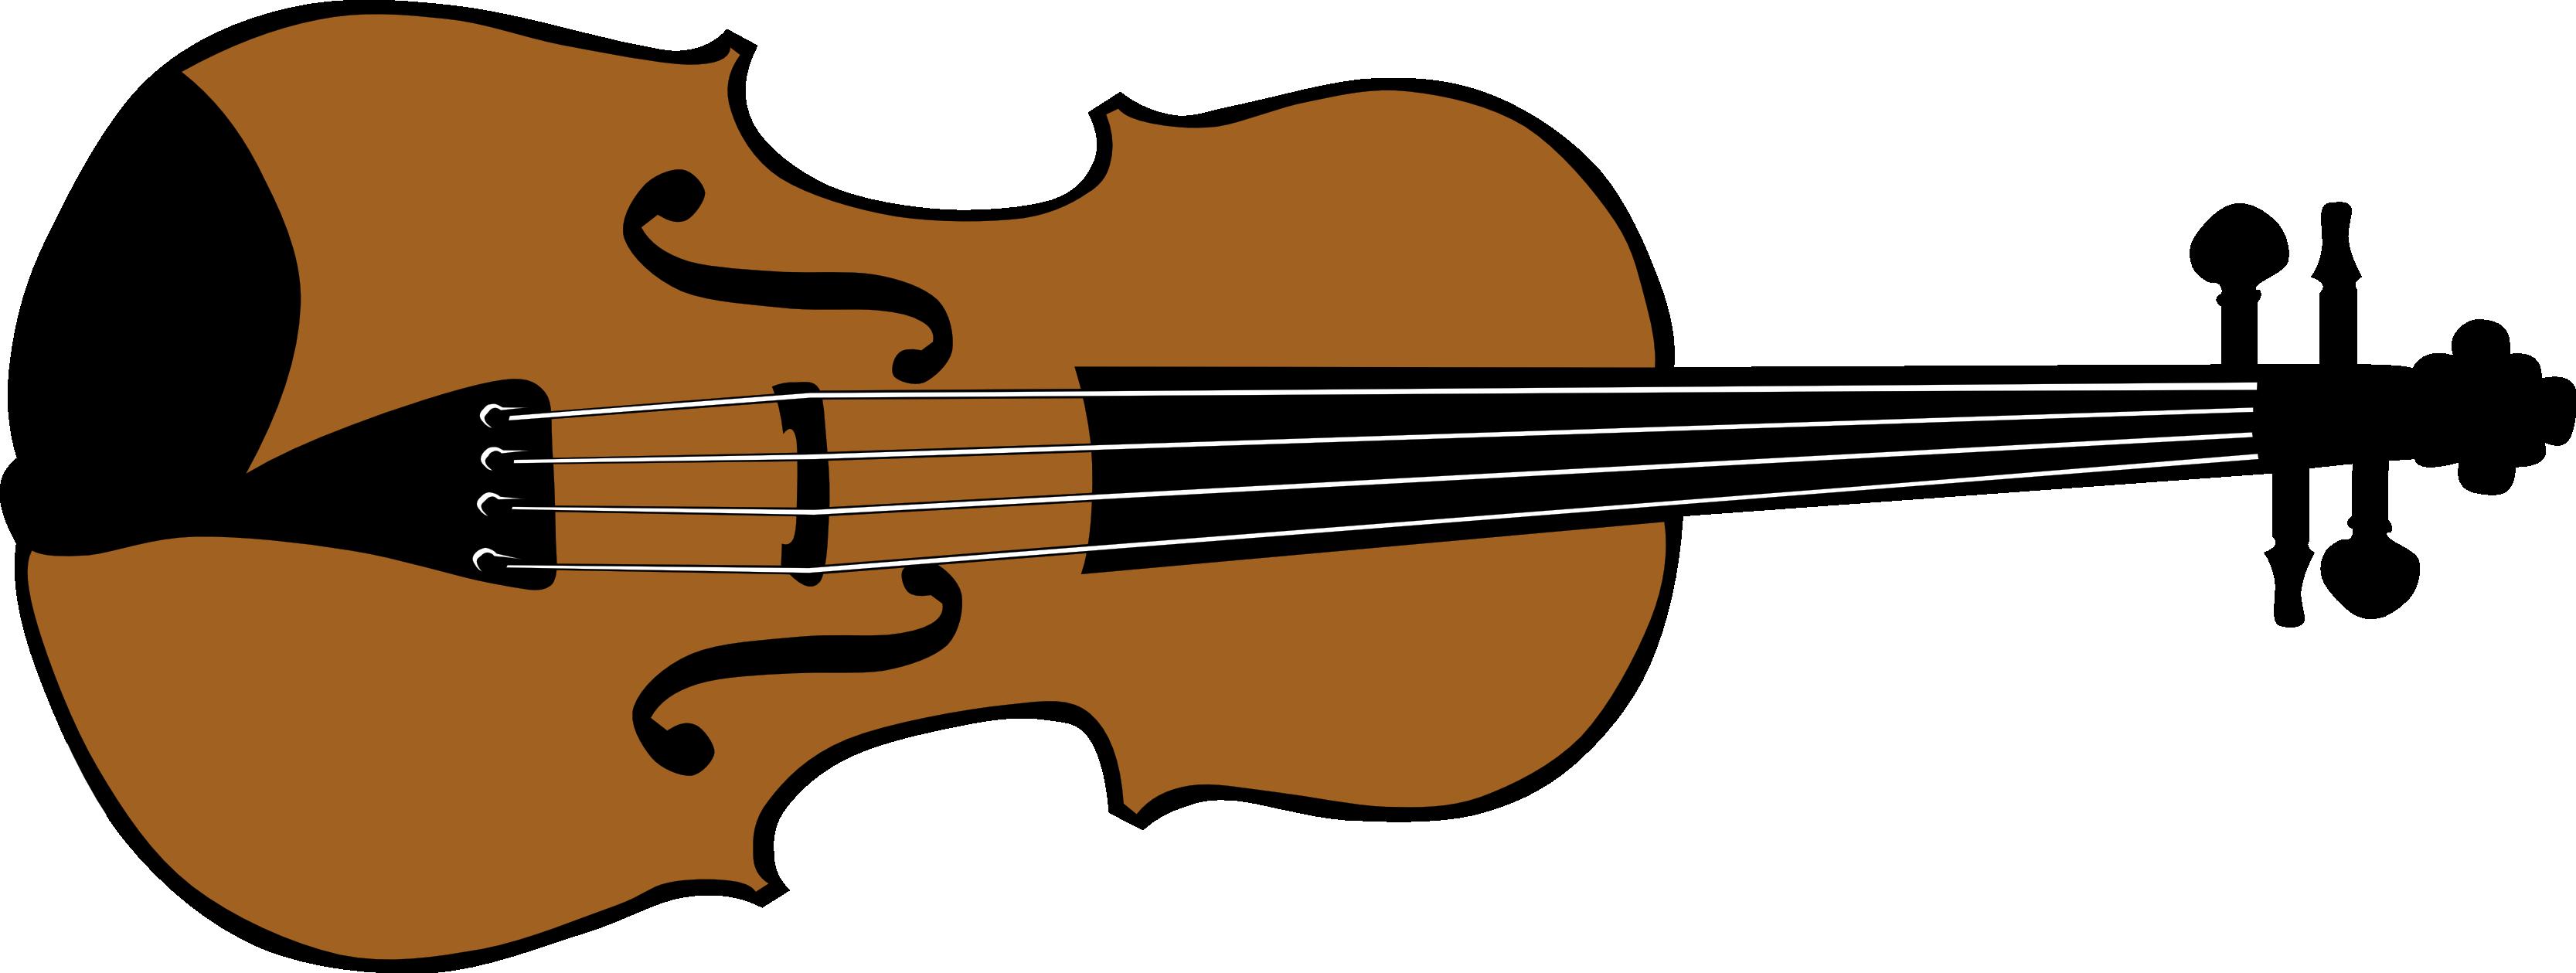 Cartoon violin clipart.